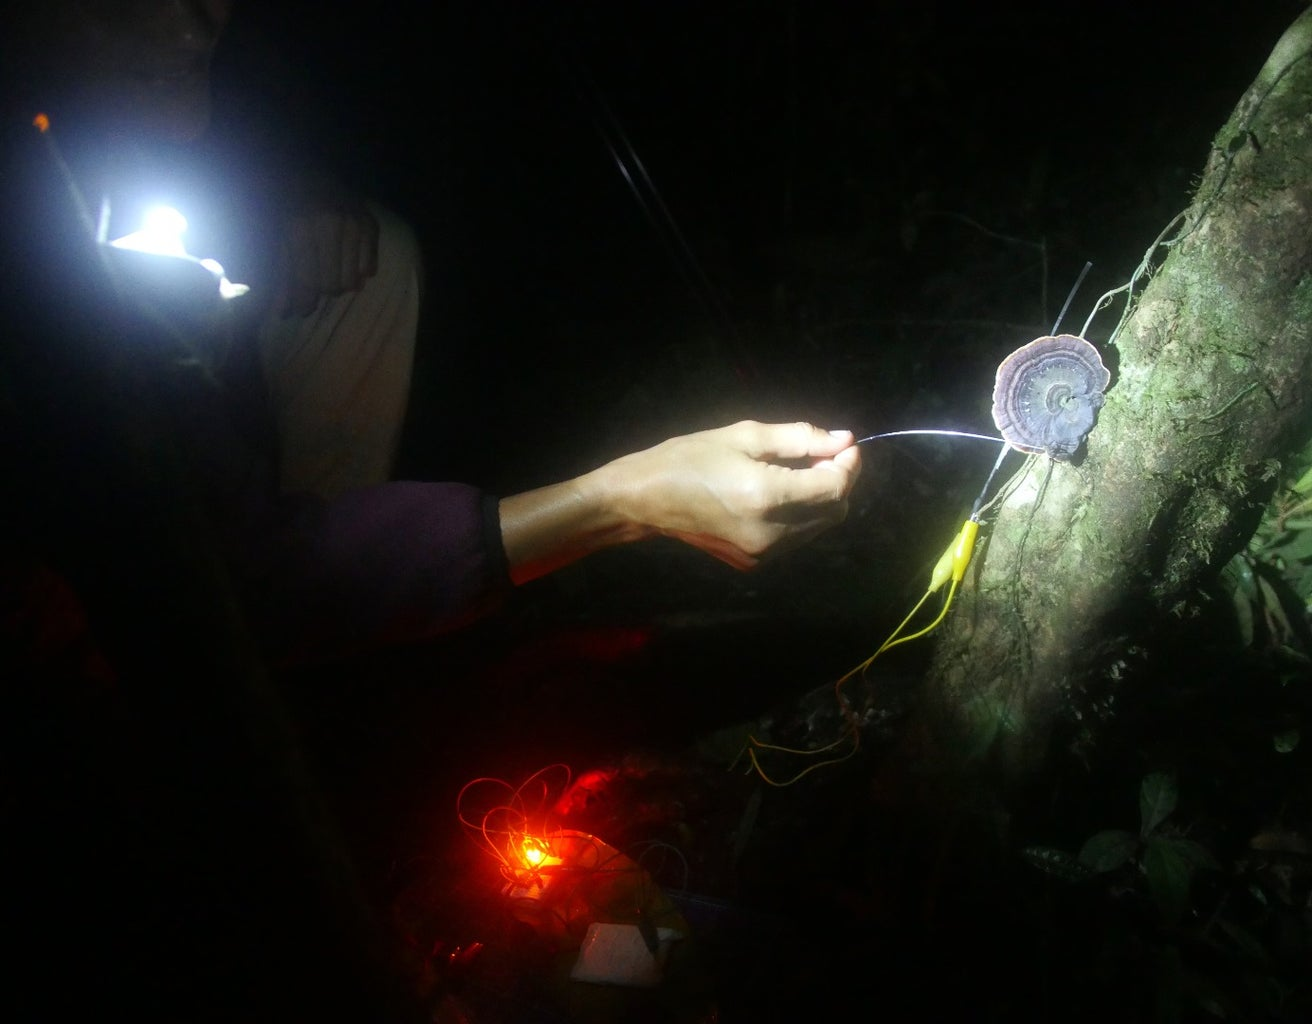 Fiber Optic Point Sensors and Display: Background